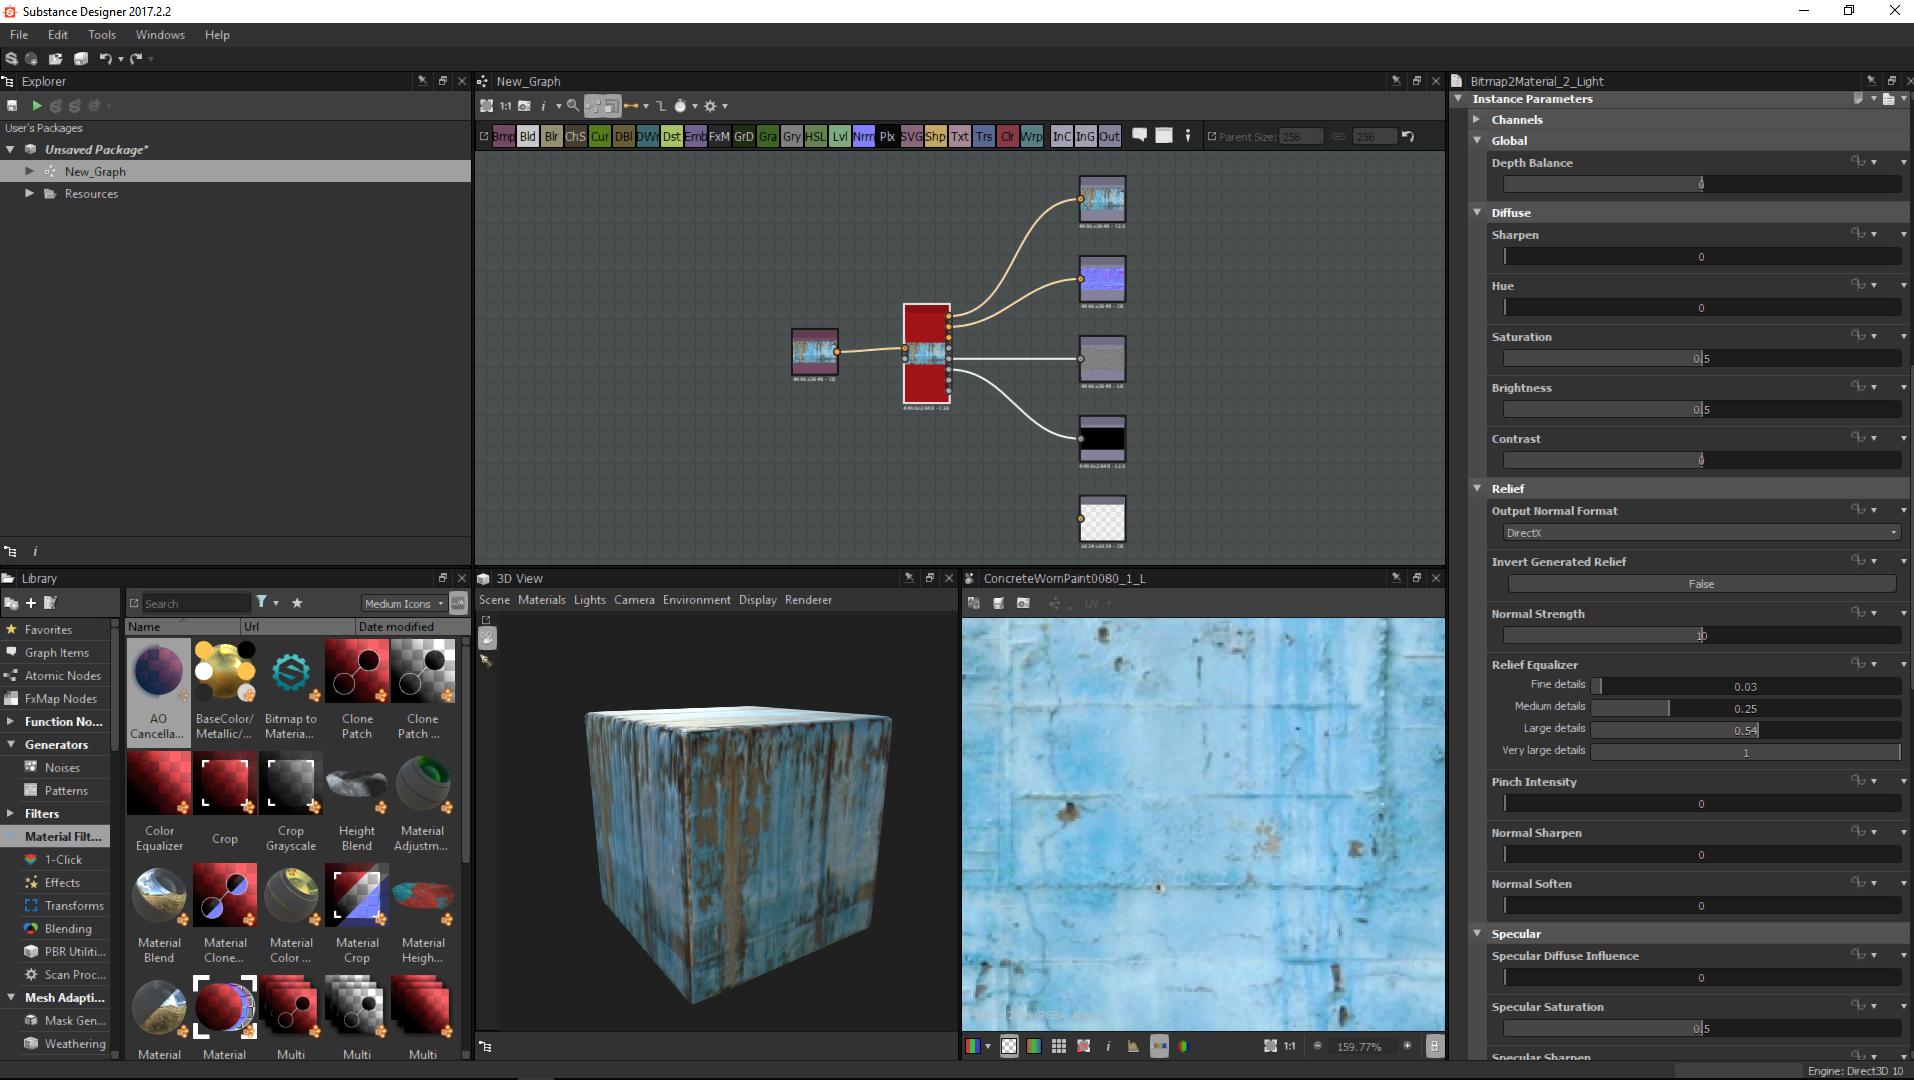 Substance Editor - Viz Artist and Engine